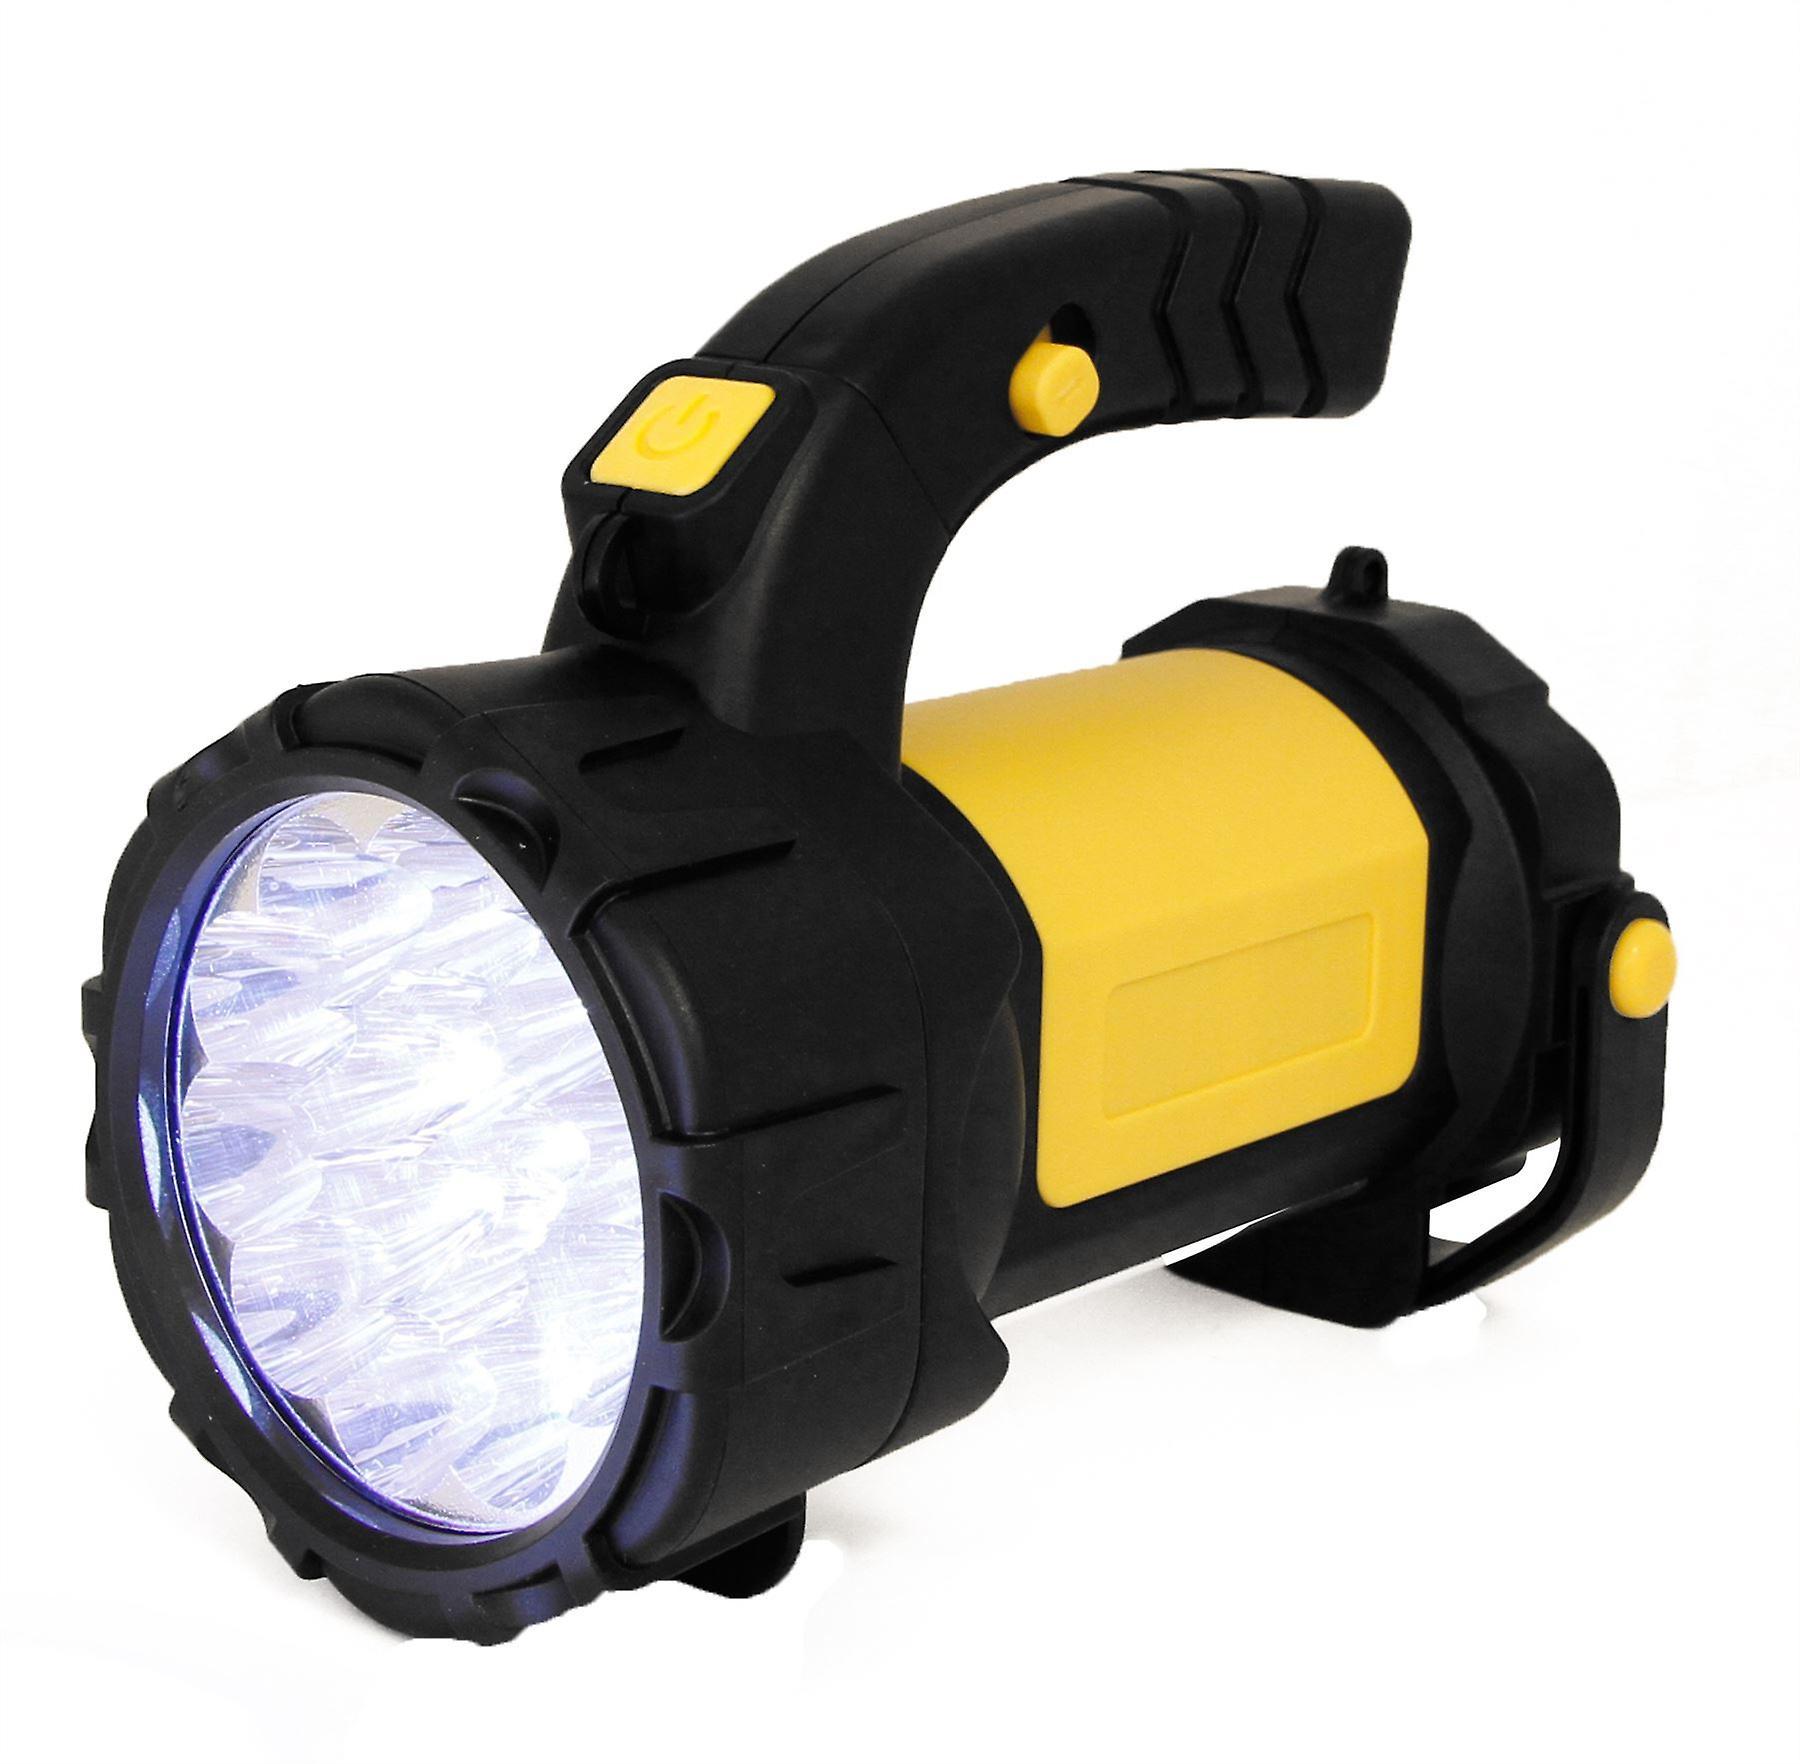 Rolson Work Light 15 + 12 LED